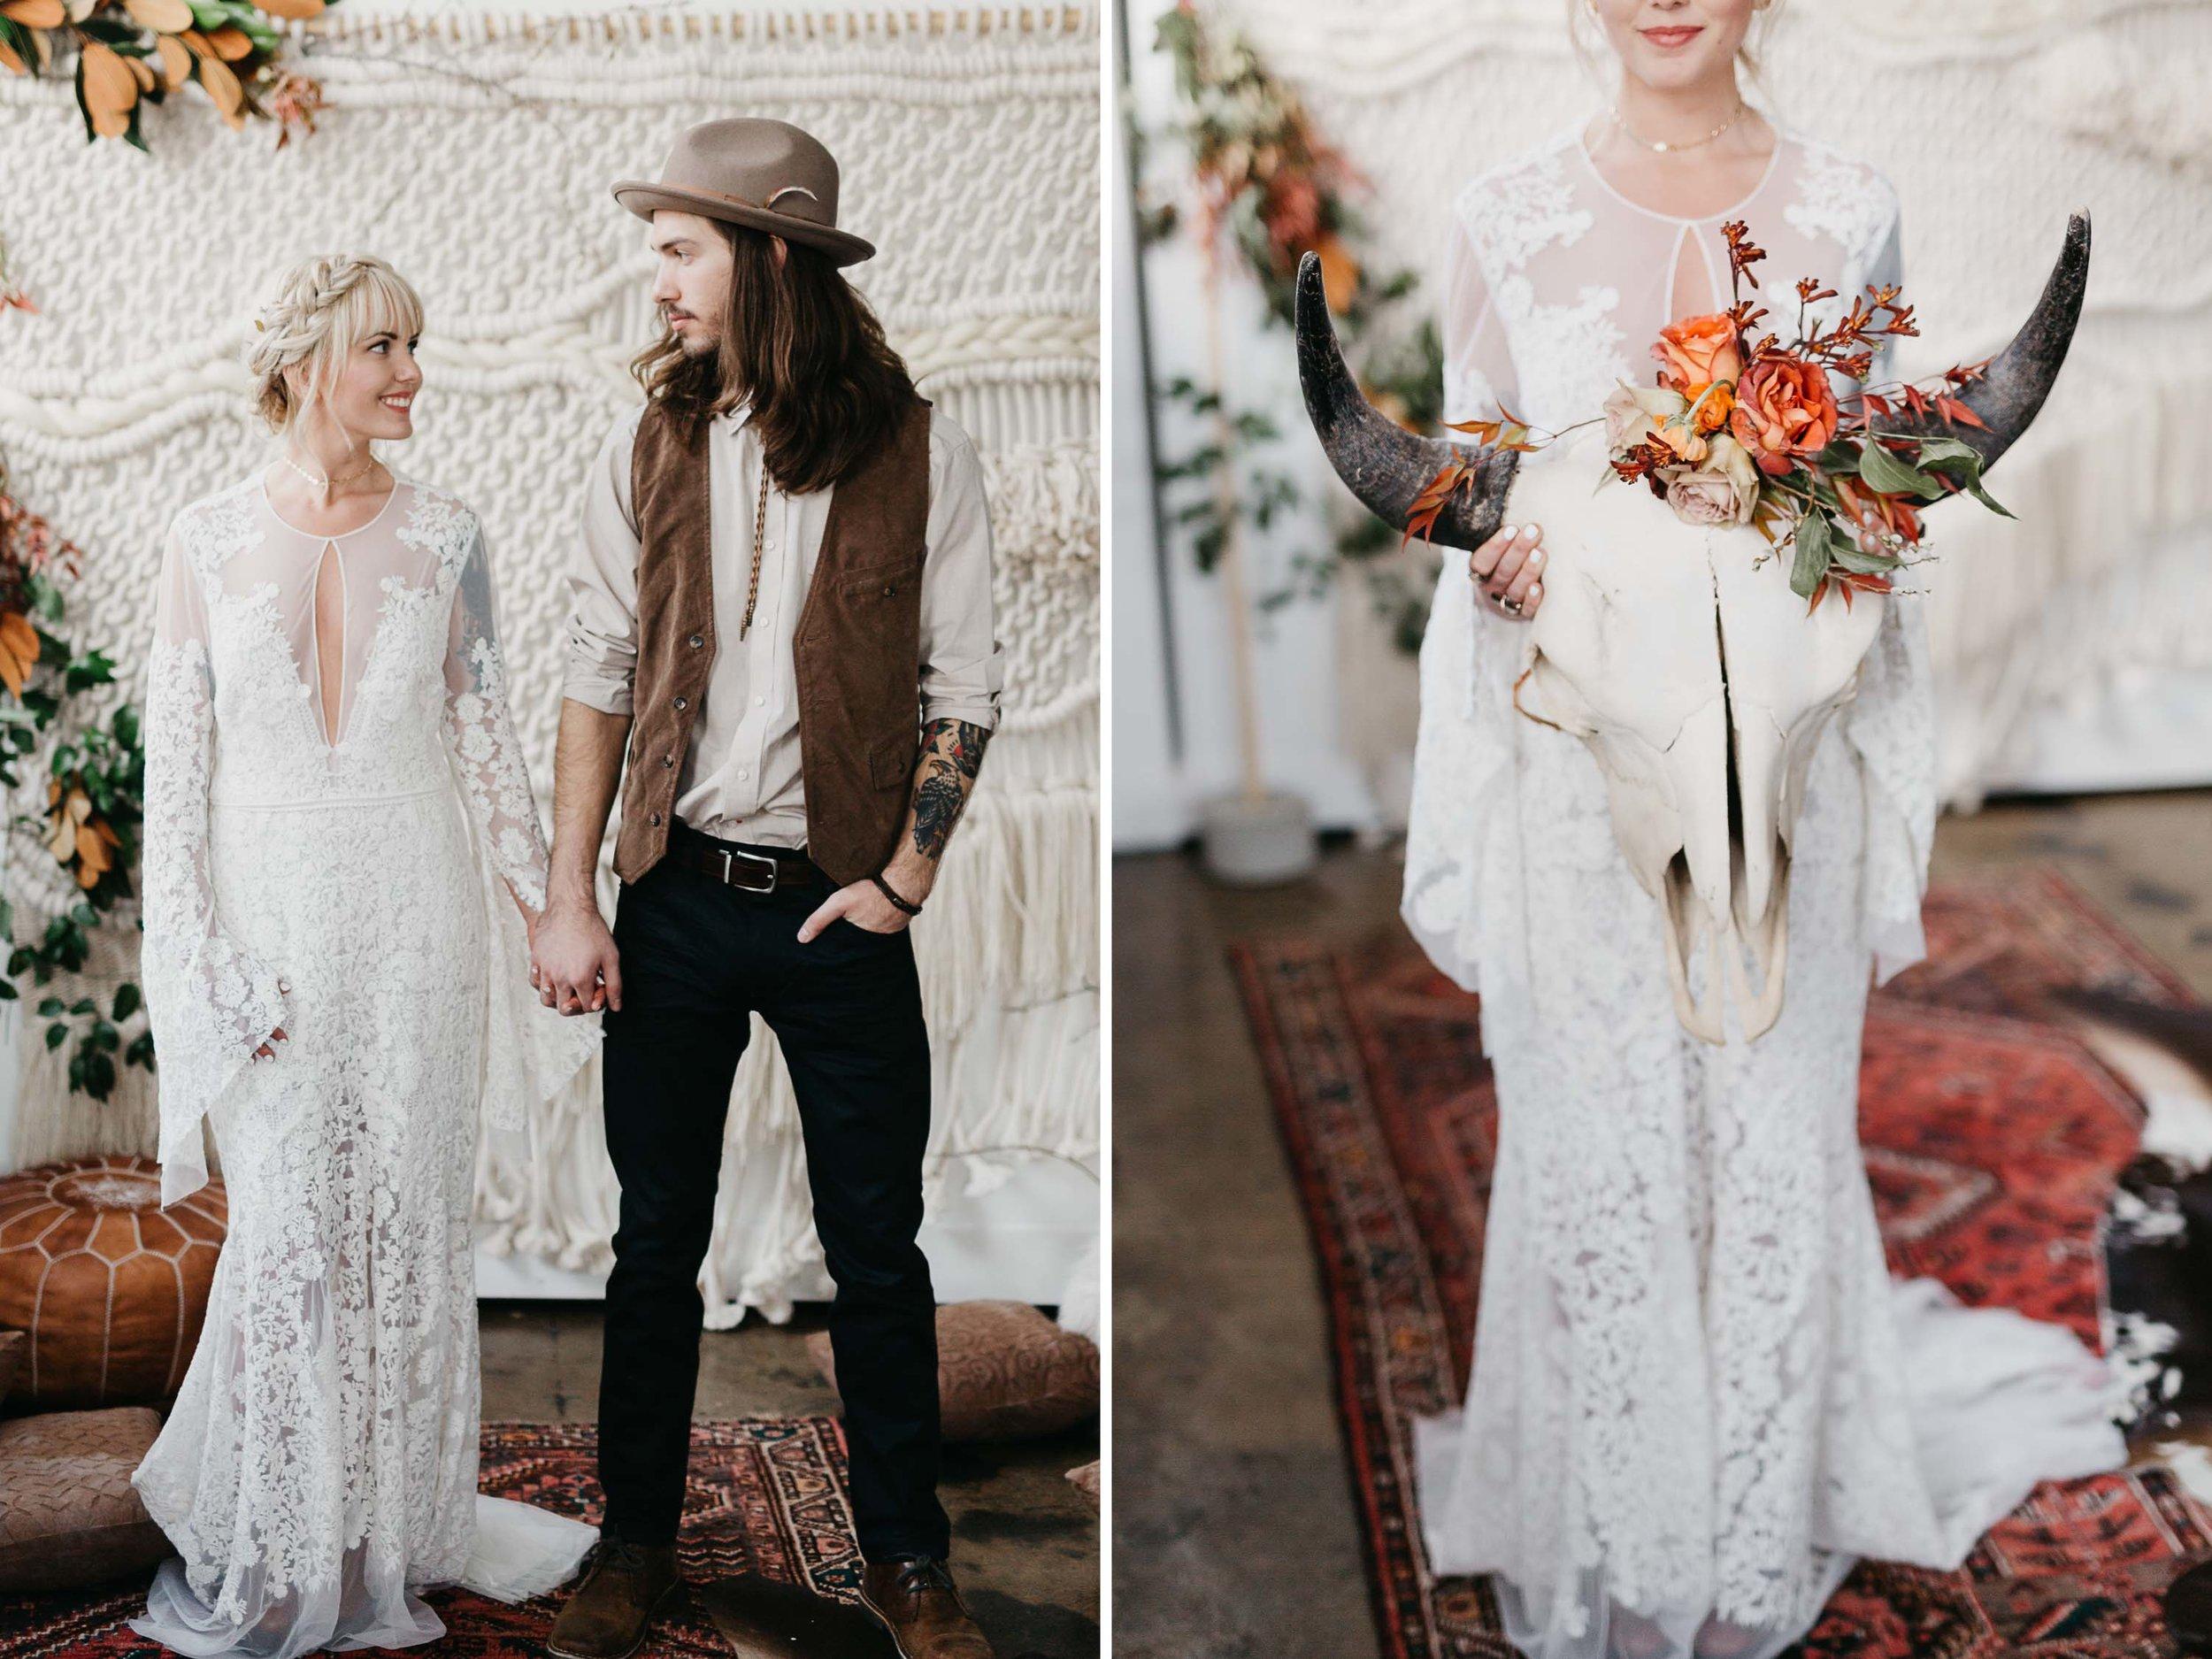 Utah-Wedding-Photographer-06.jpg